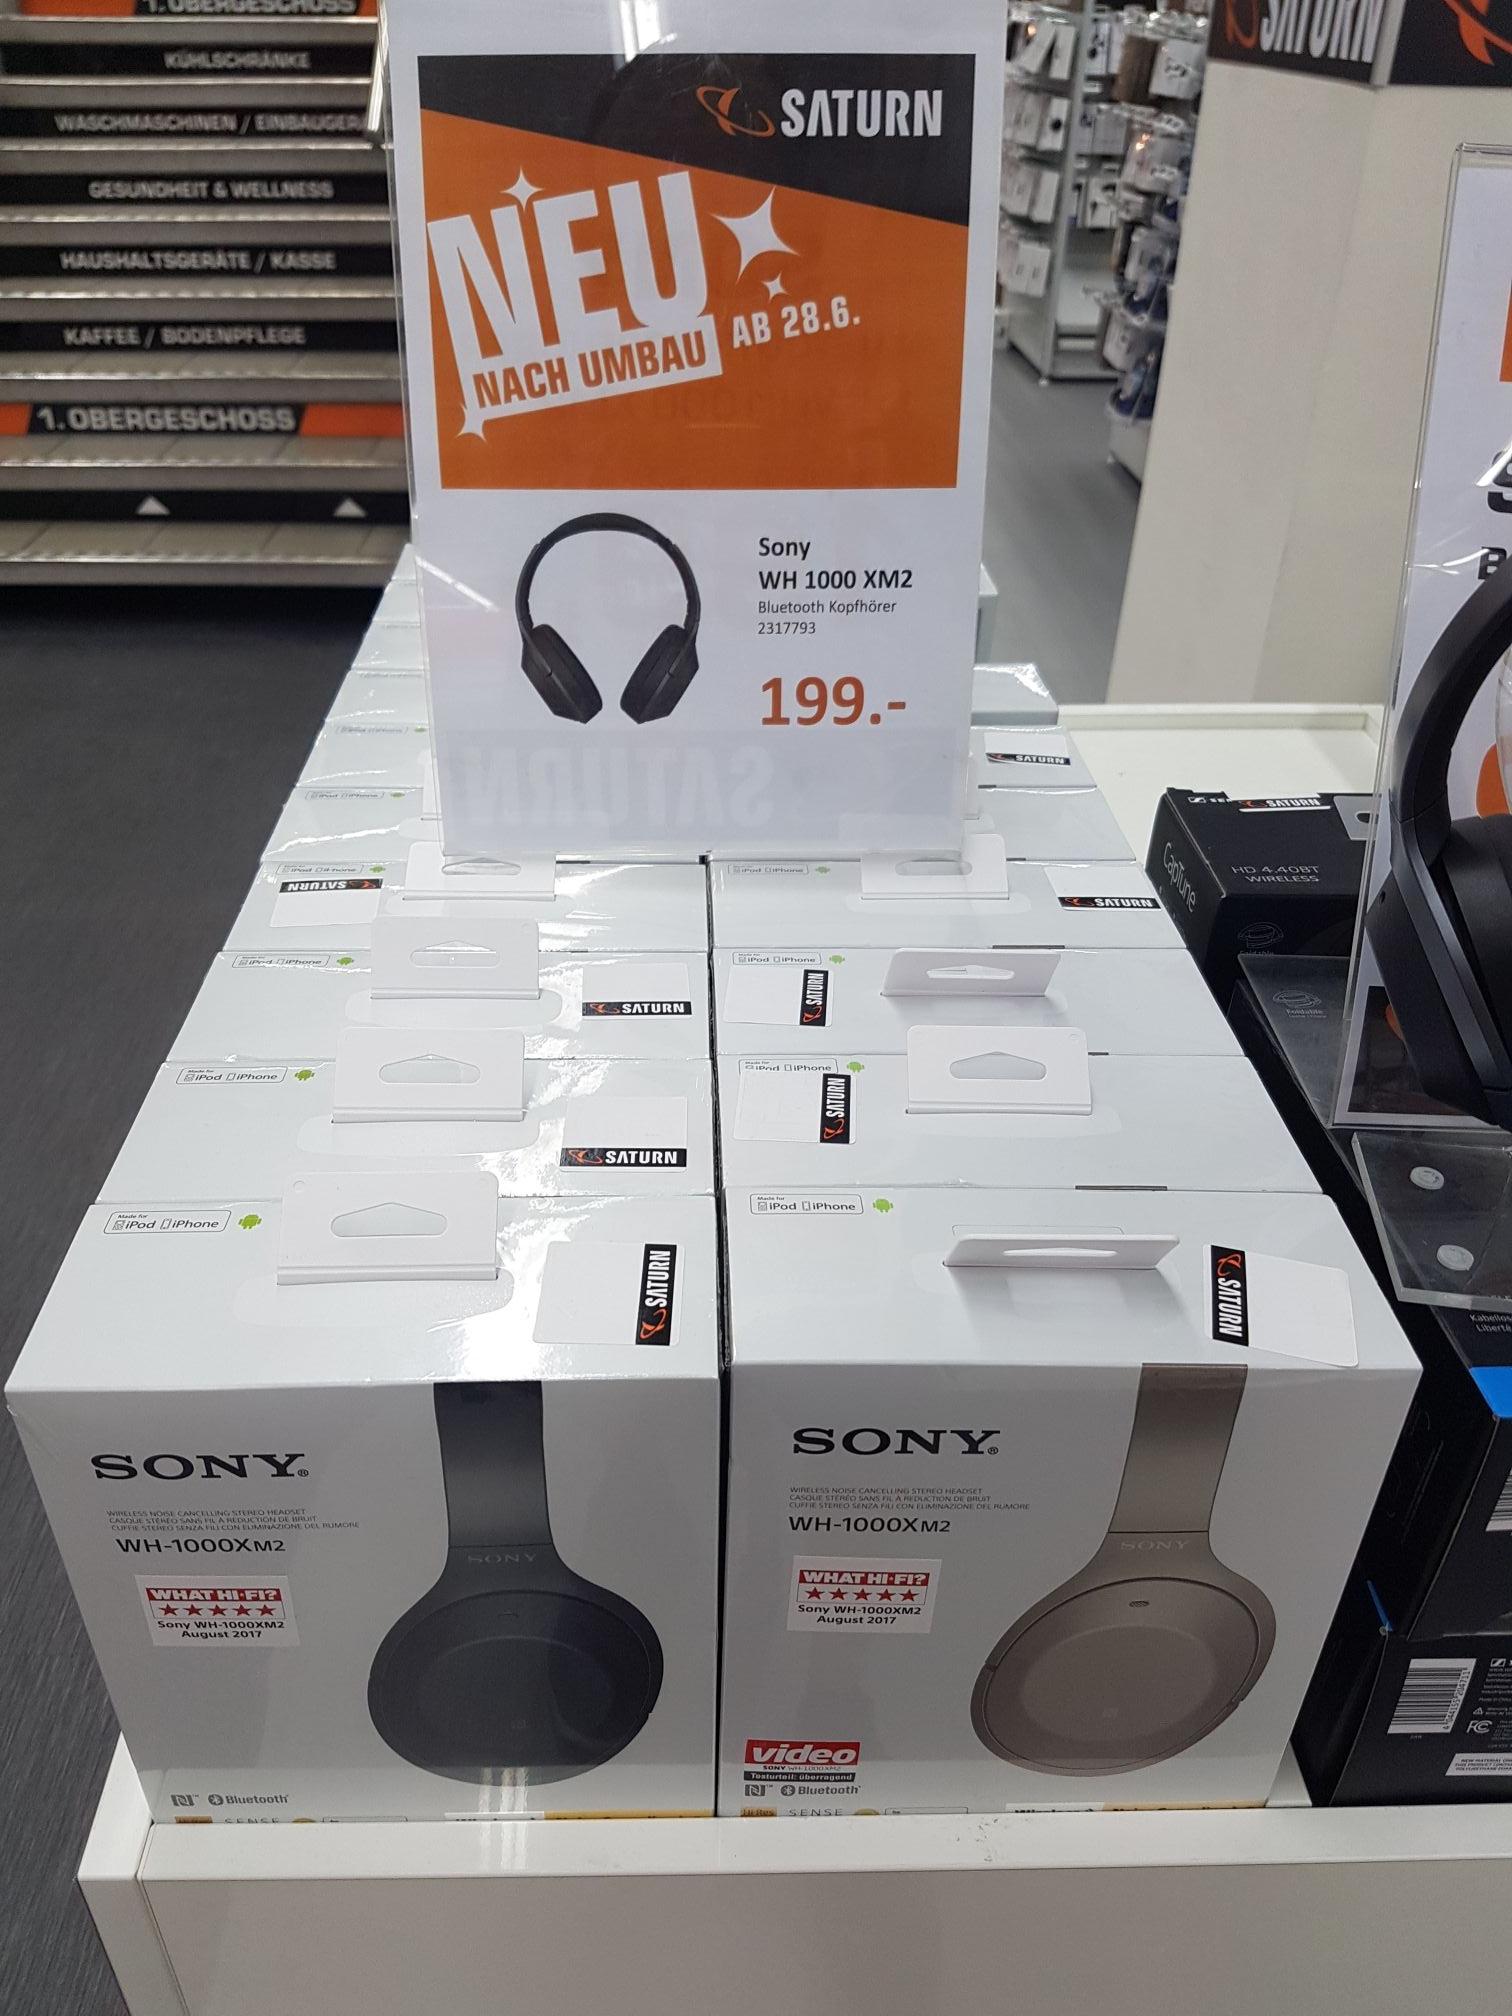 [LOKAL Leipzig] Sony WH-1000XM2 Bluetooth-Kopfhörer mit ANC